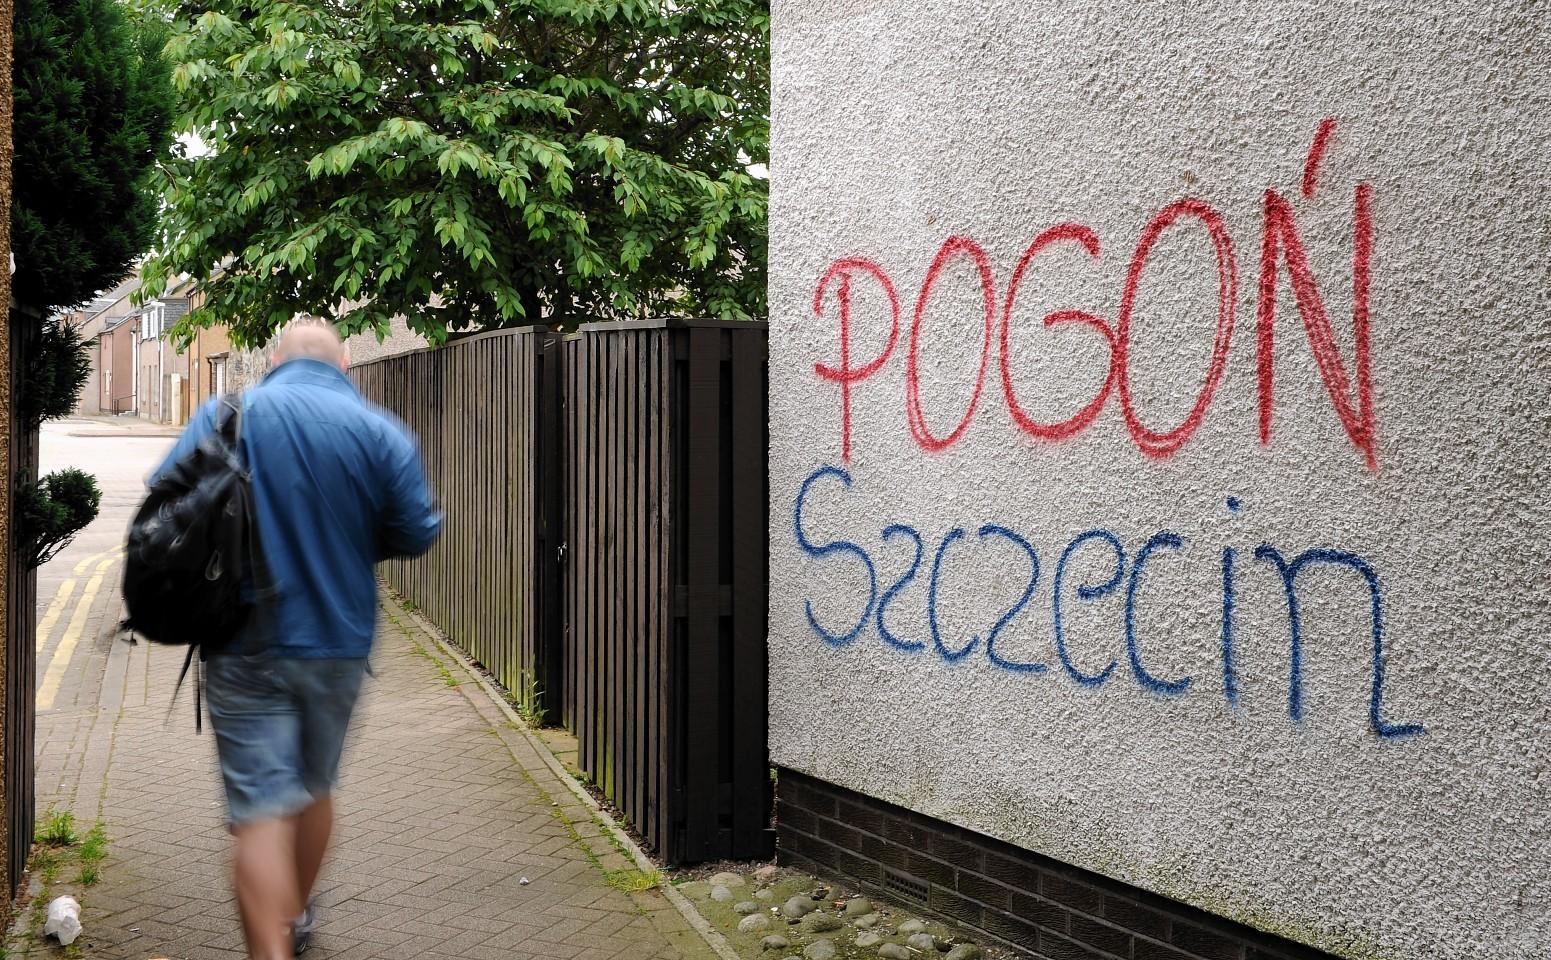 Polish vandalism has angered local residents